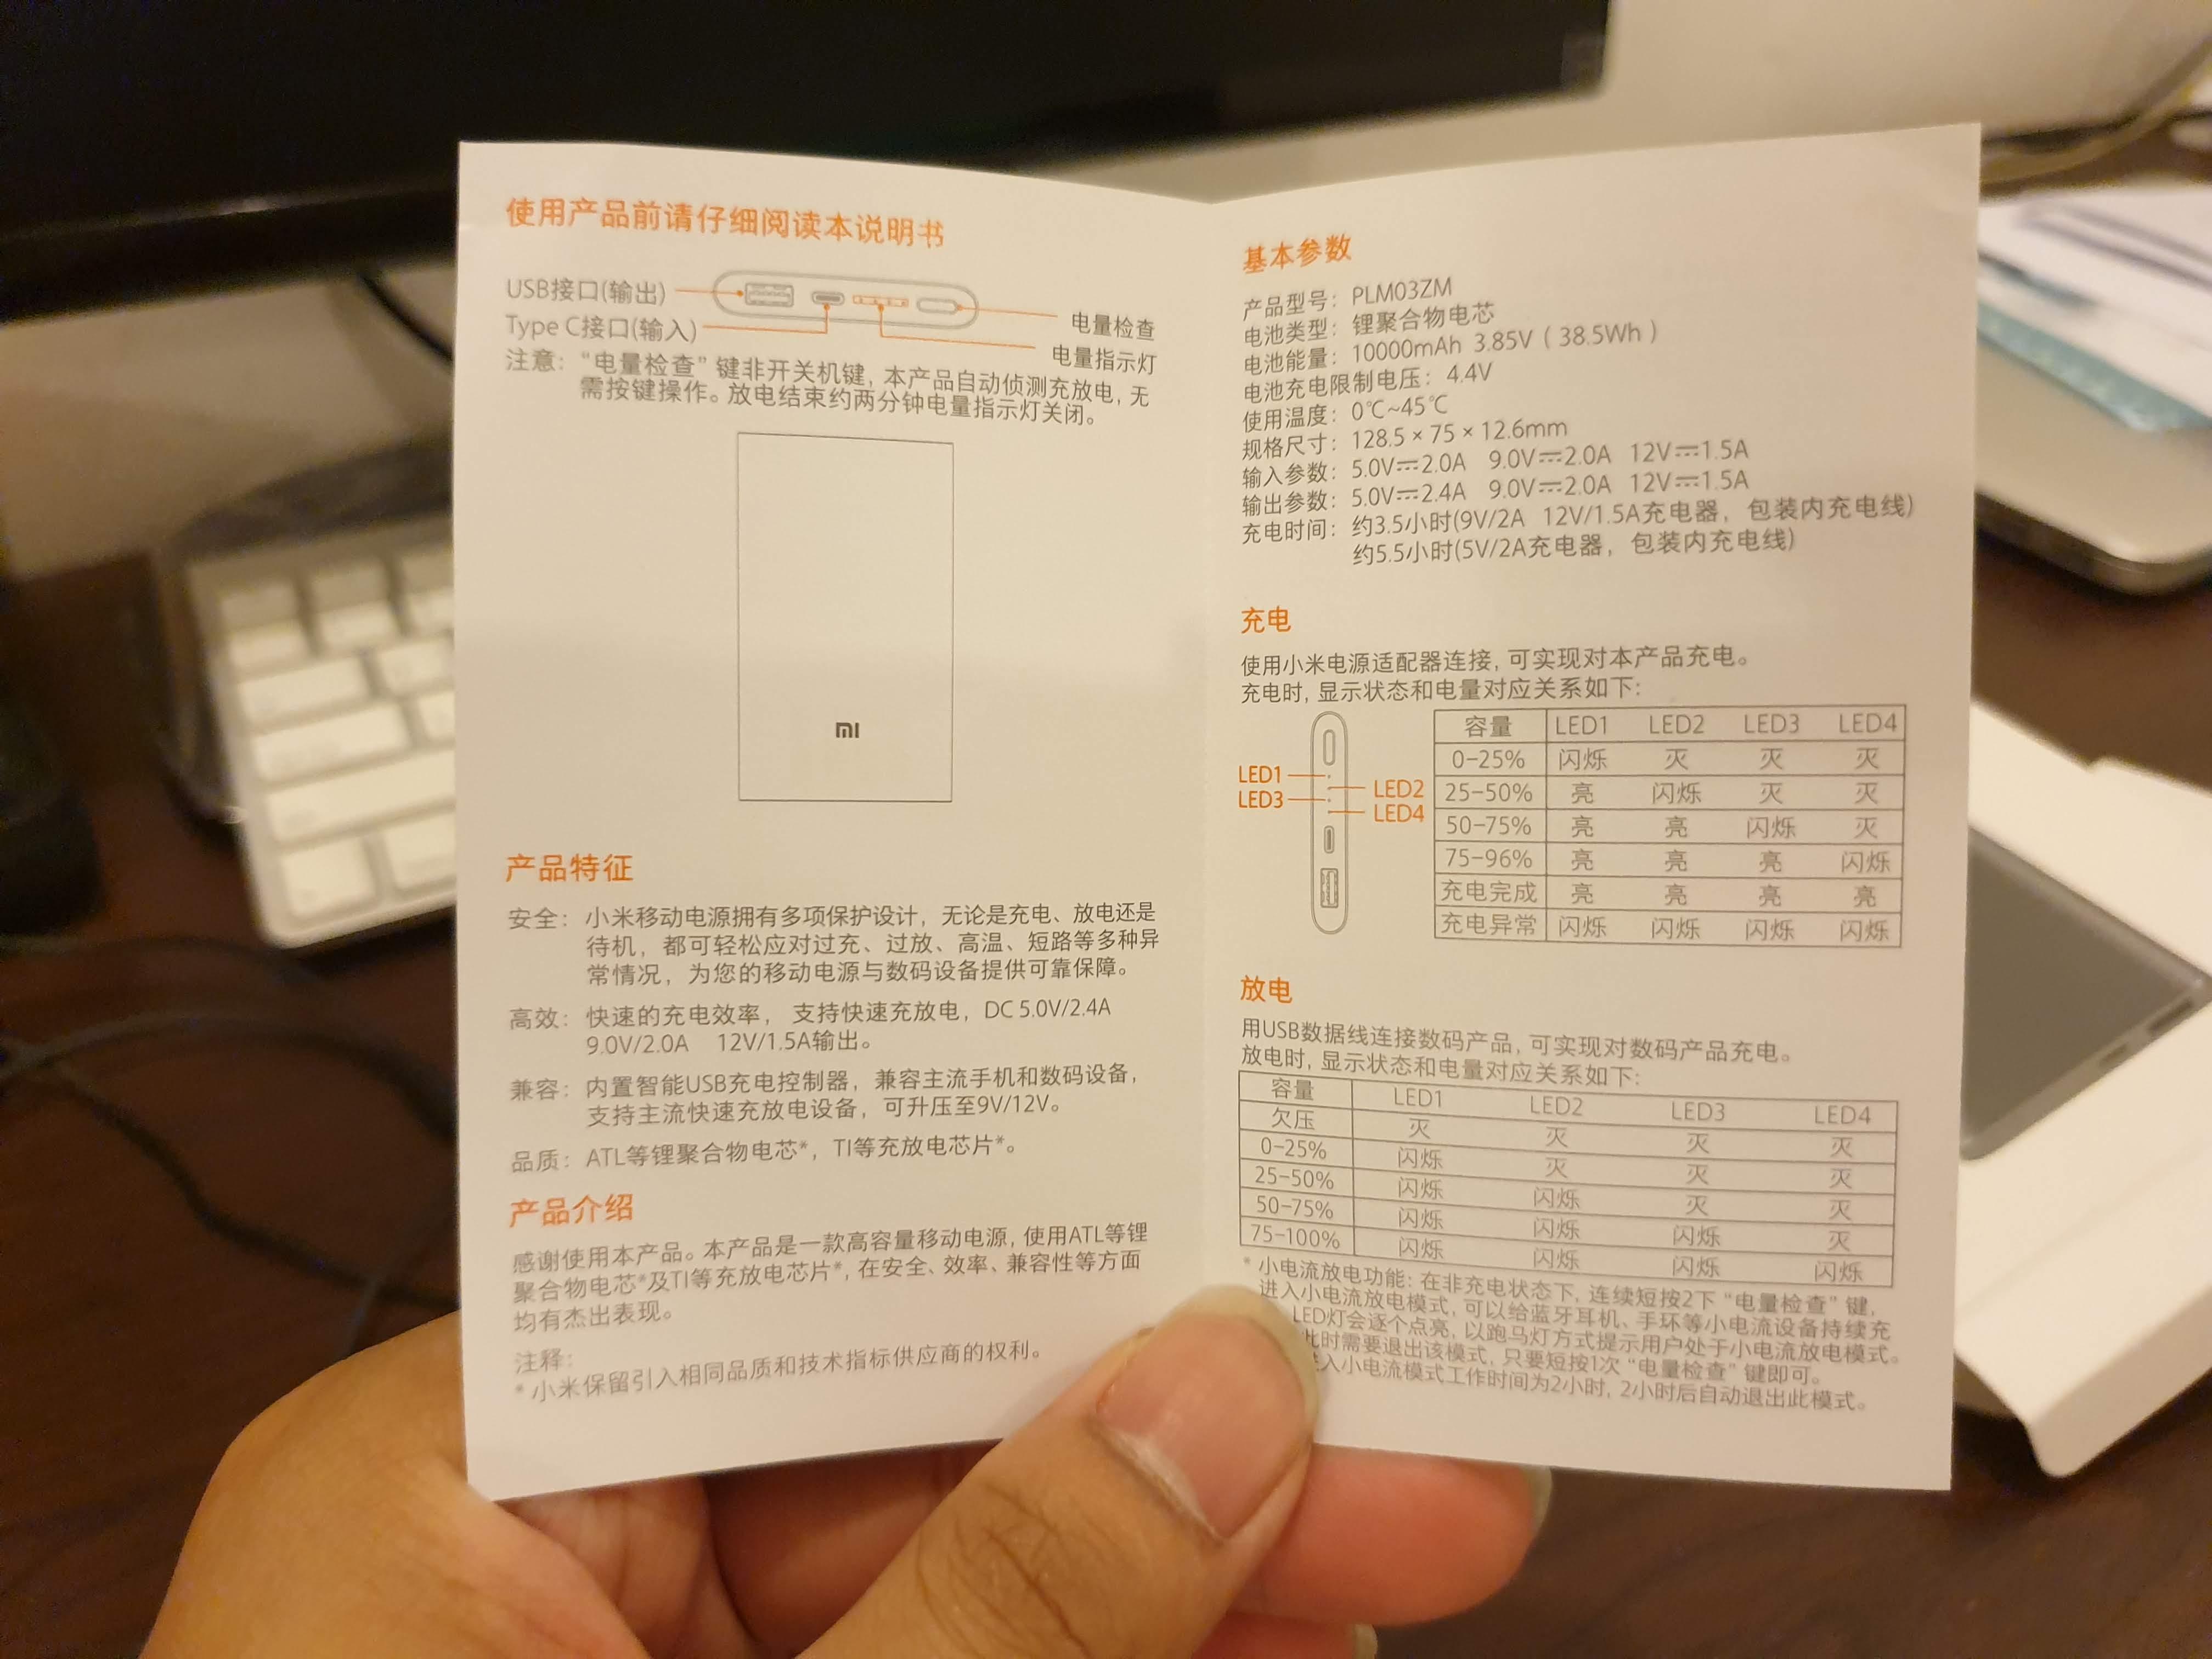 Mi Power Bank Pro 10000 Manual